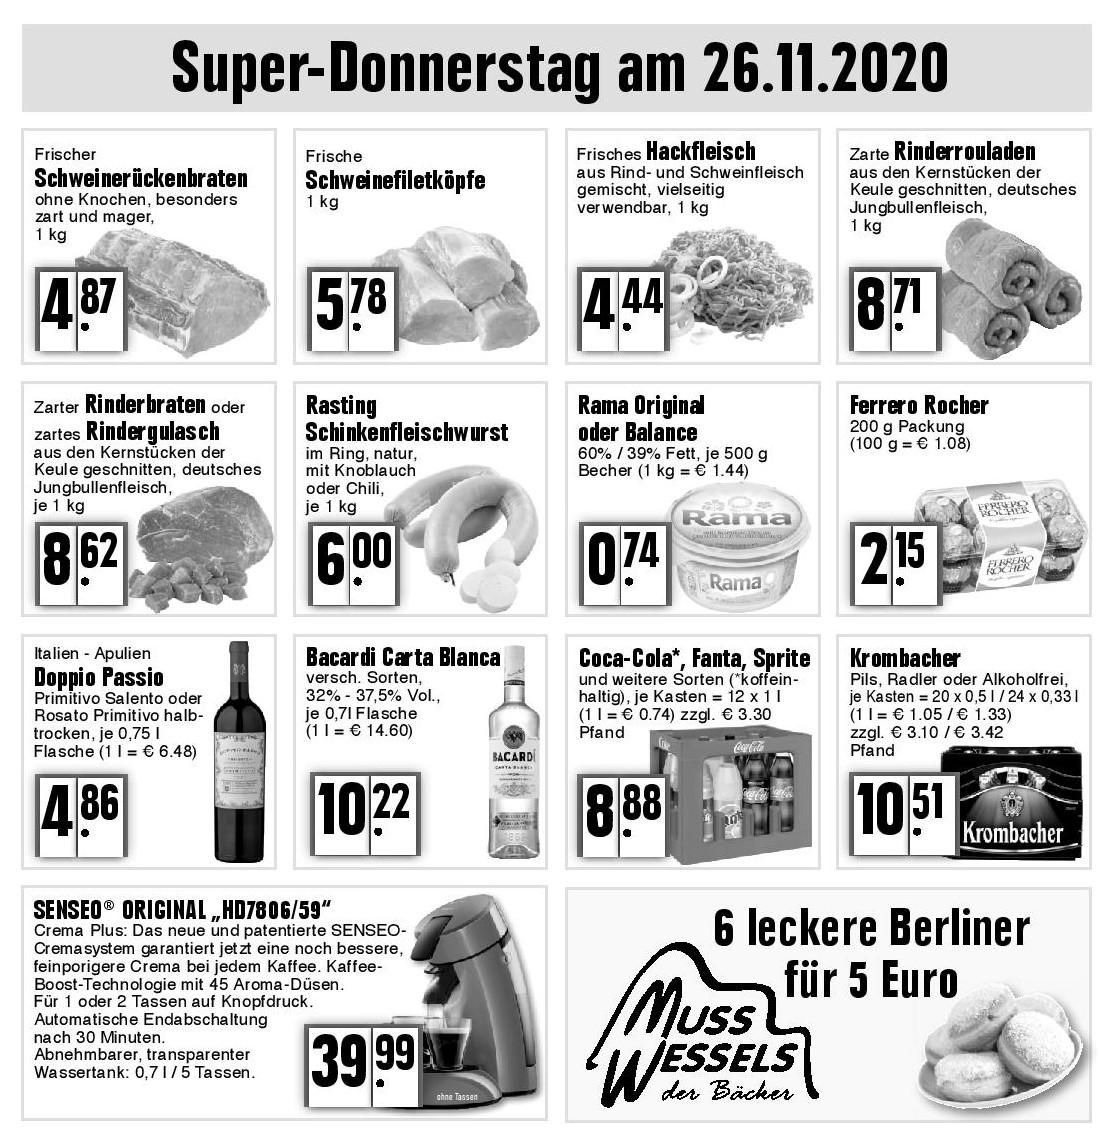 Super-Donnerstag am 26.11.2020